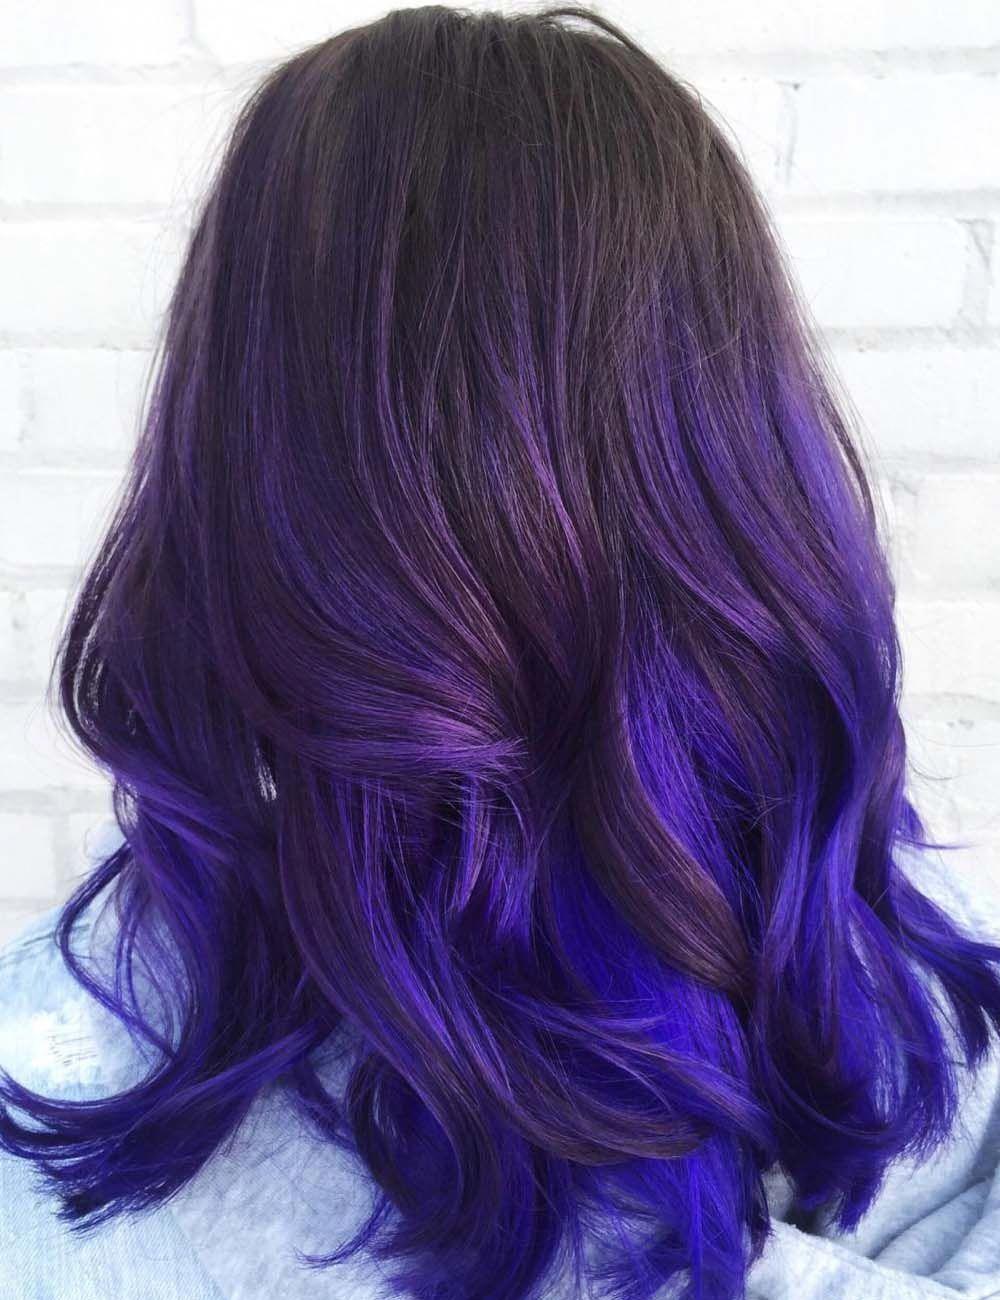 These Caramel Balayage Short Hair Are Fab Caramelbalayageshorthair Balayage Hair Purple Dark Purple Hair Purple Ombre Hair